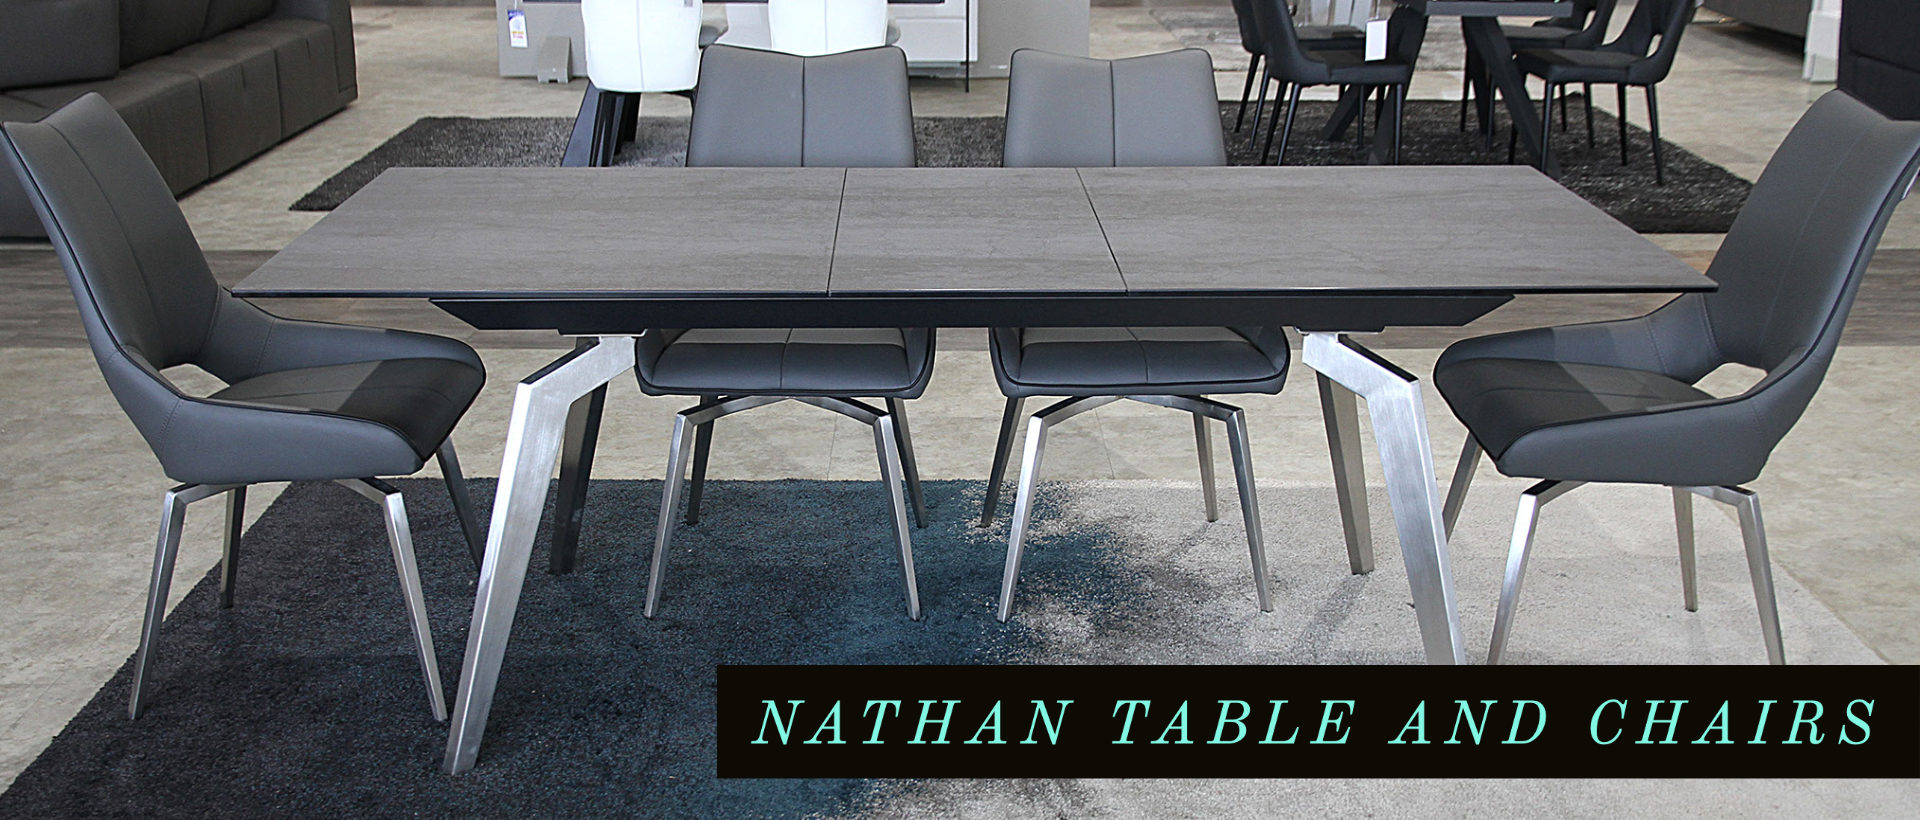 We Offer Modern Furniture In Edmonton Ab, Dining Room Sets Edmonton Alberta